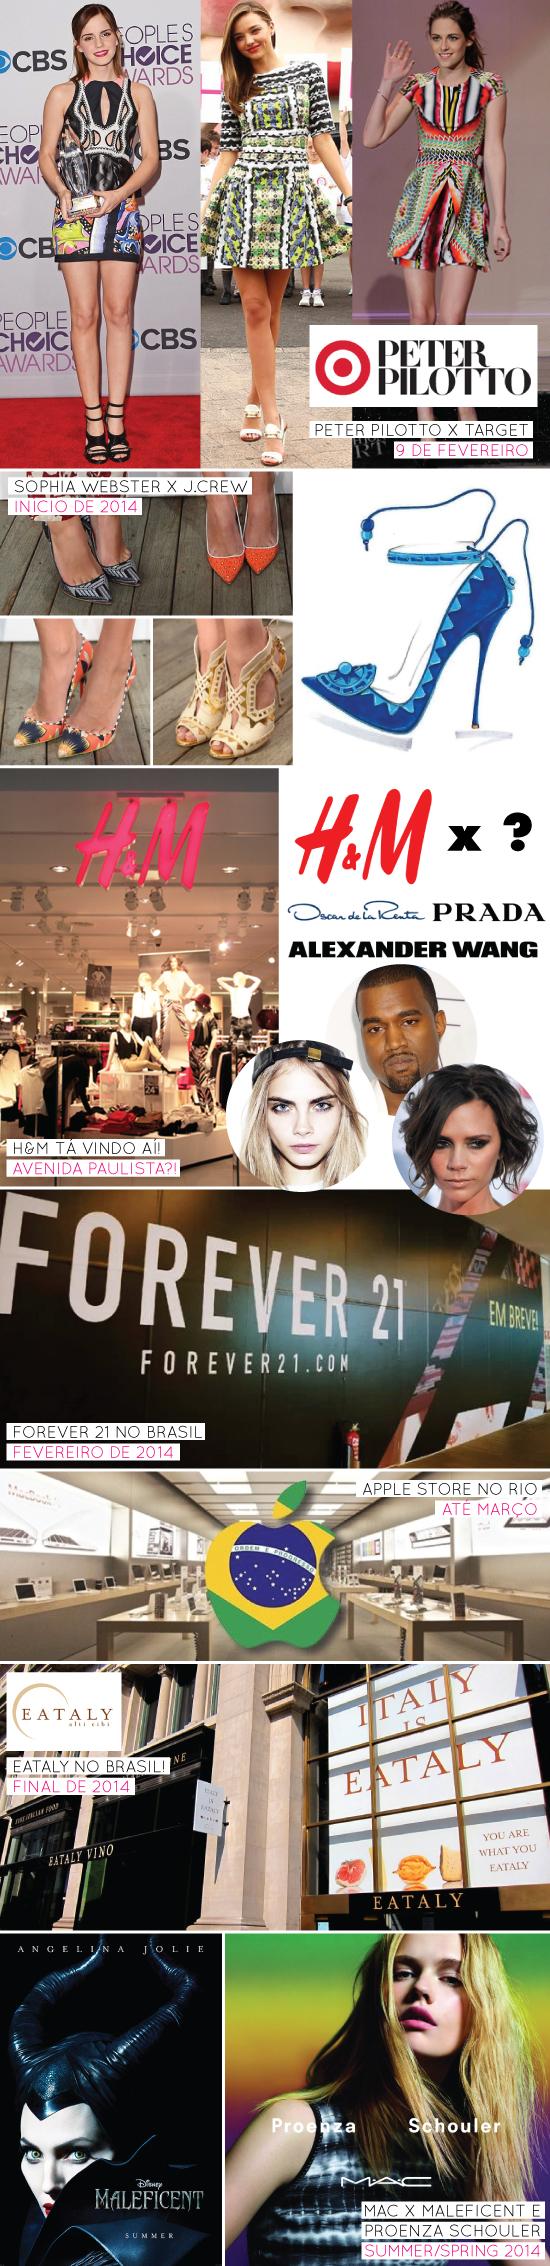 EXPECTATIVAS-fashion-moda-lojas-brasil-colecoes-parcerias-colaboracao-designer-peter-pilotto-target-h&m-forever-21-collaboration-2014-ano-novo-proximo-shopping-rio-de-janeiro-sao-paulo-h&m-etaly-restaurante-apple-store-village-mall-jcrew-sophia-webster-blog-estilo